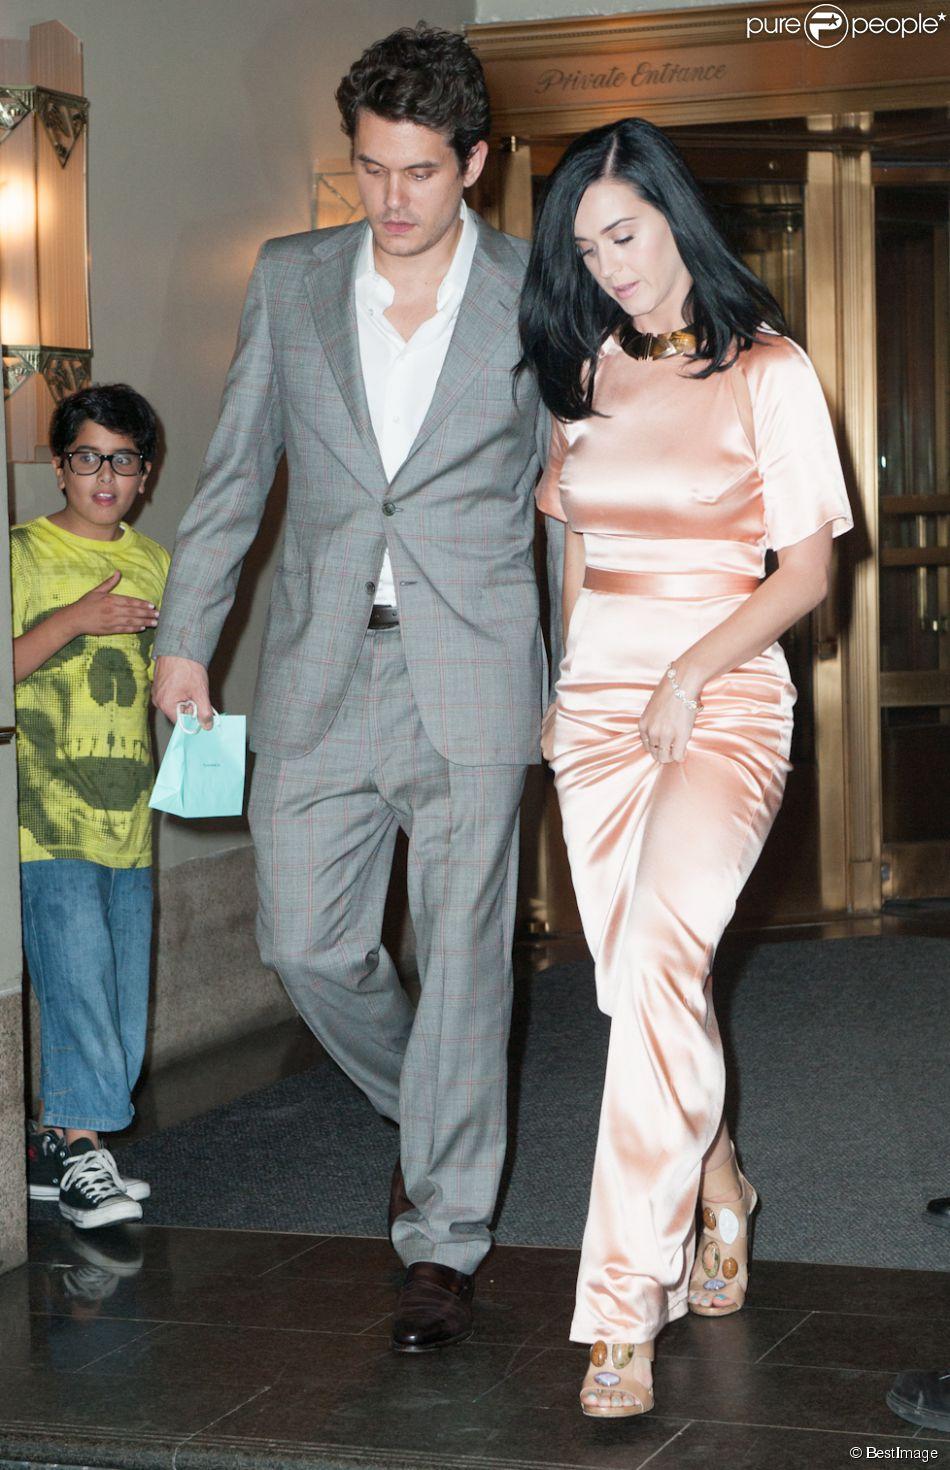 "Katy Perry, au bras de John Mayer, sort du club ""Friars Club Roast of Don Rickles"" au Waldorf Astoria a New York. Le 24 juin 2013"